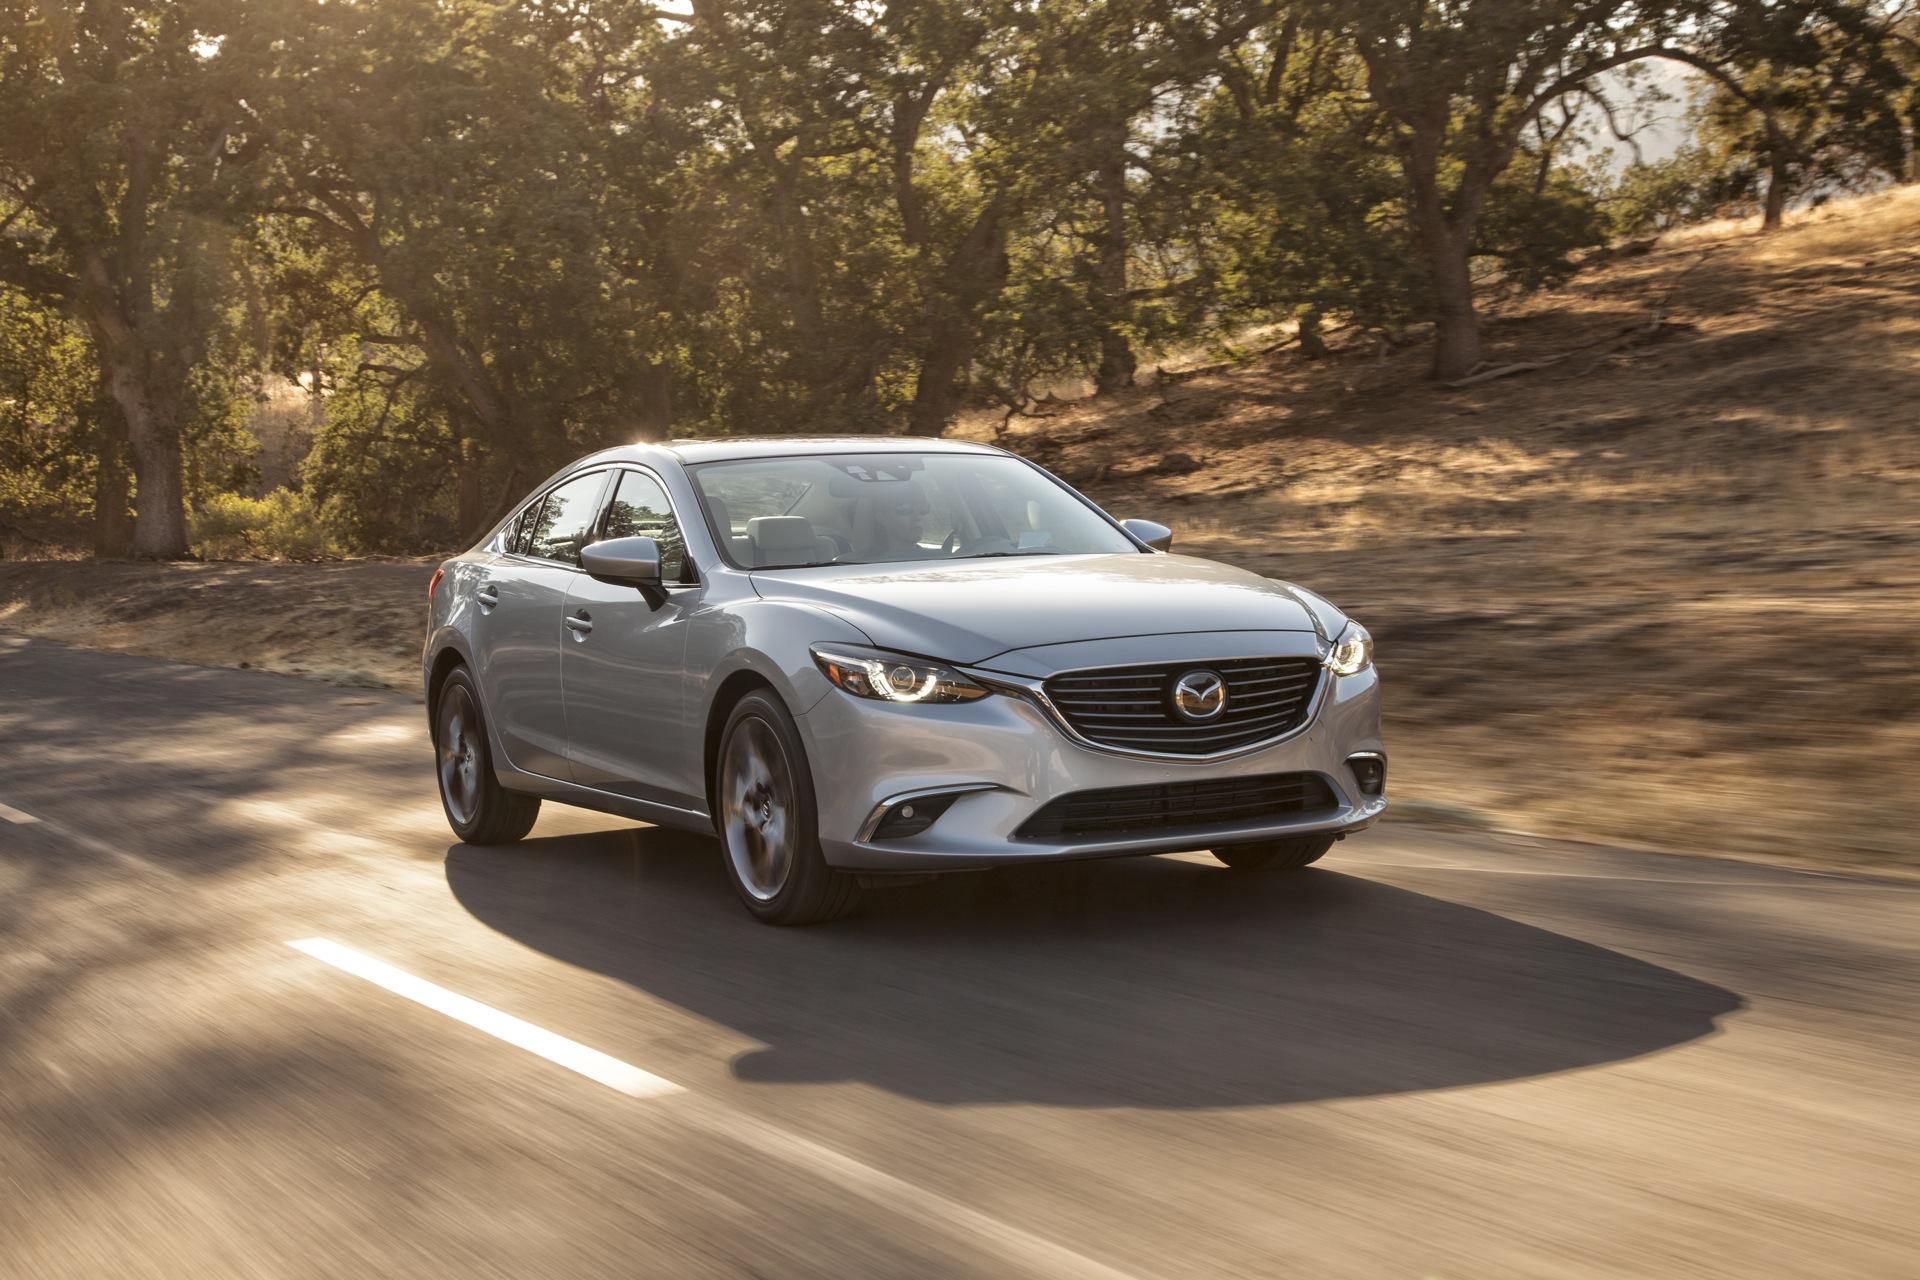 2014-2016 Mazda3, Mazda6 recalled over parking brake woes